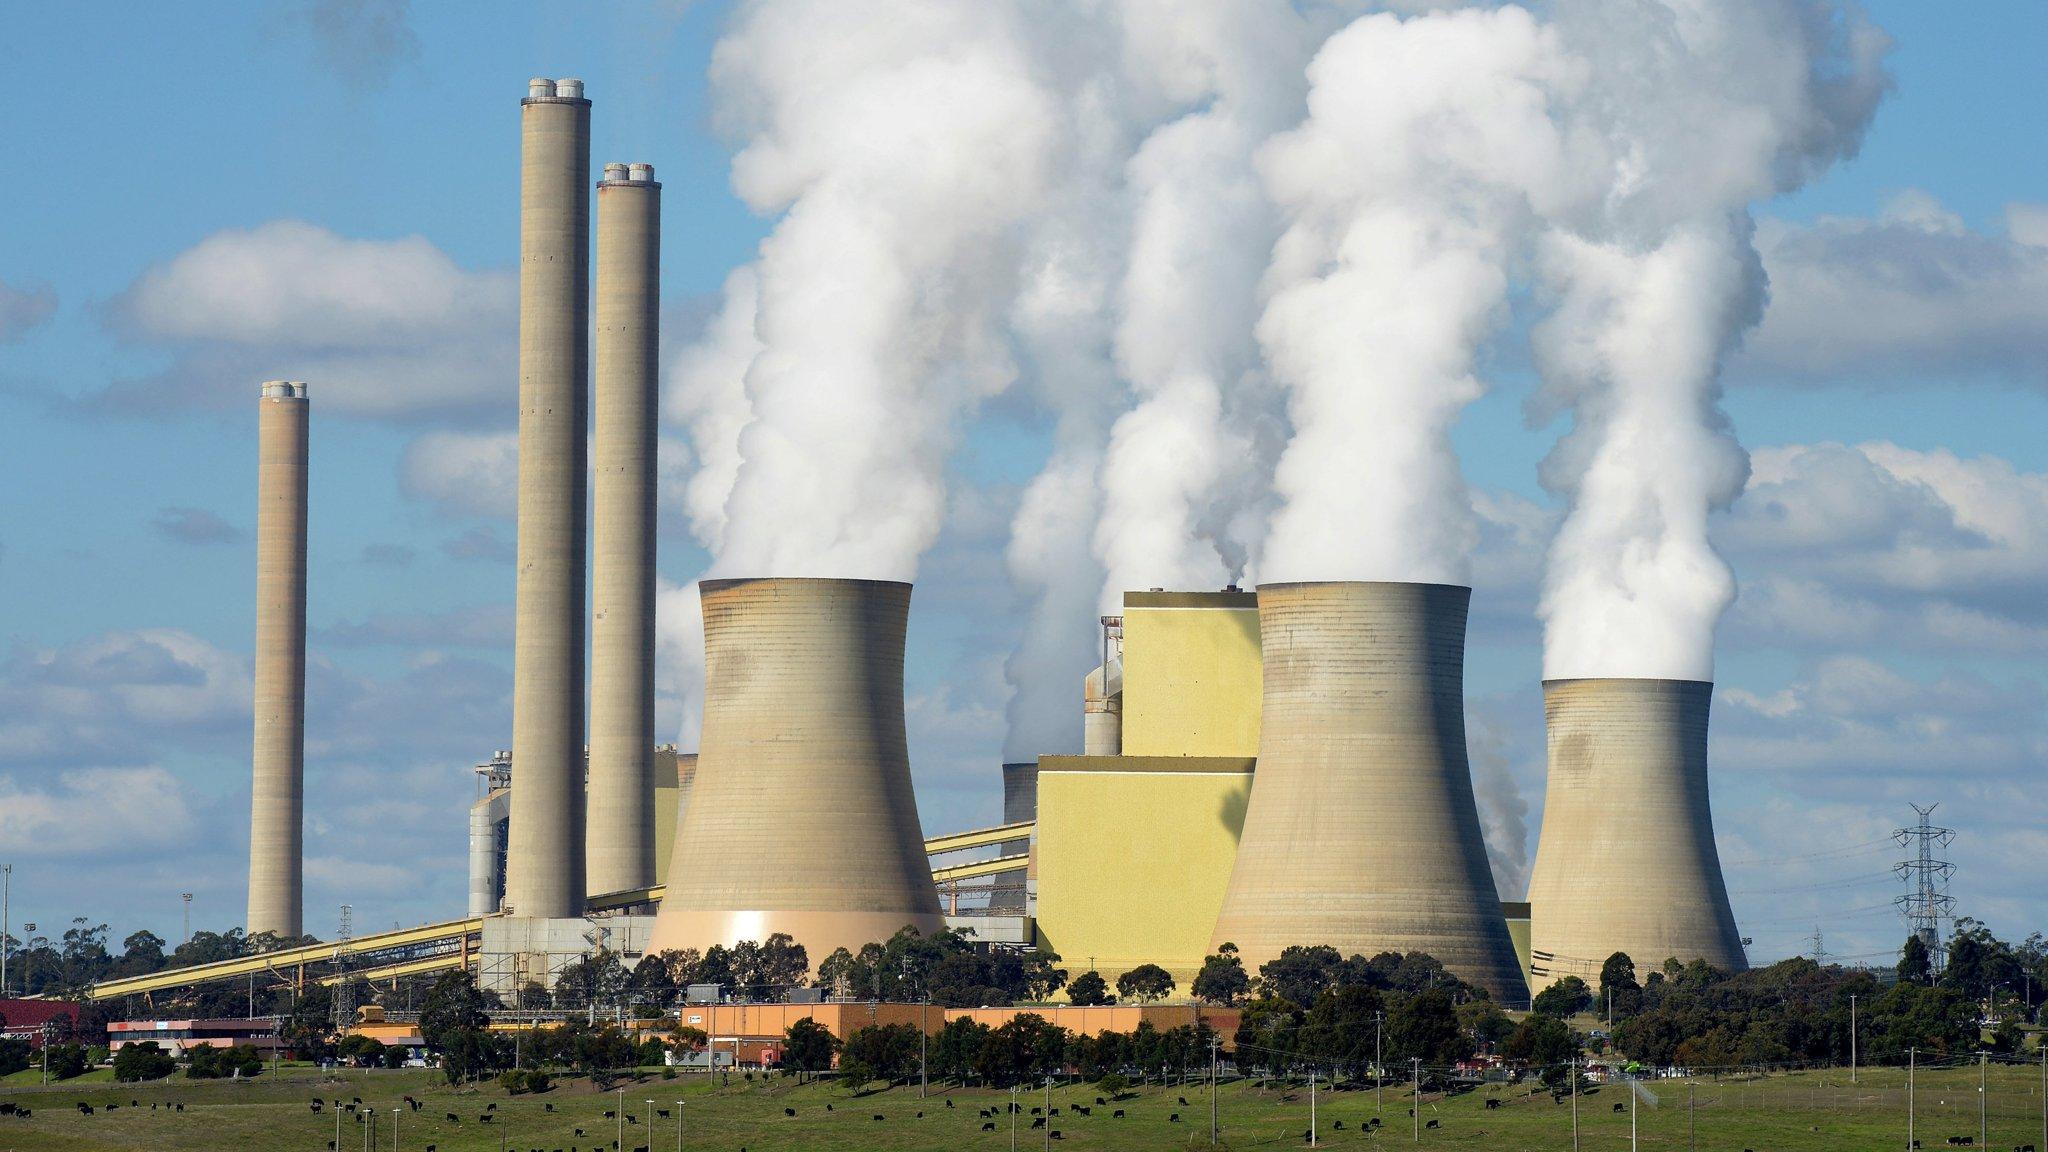 7.Power plant